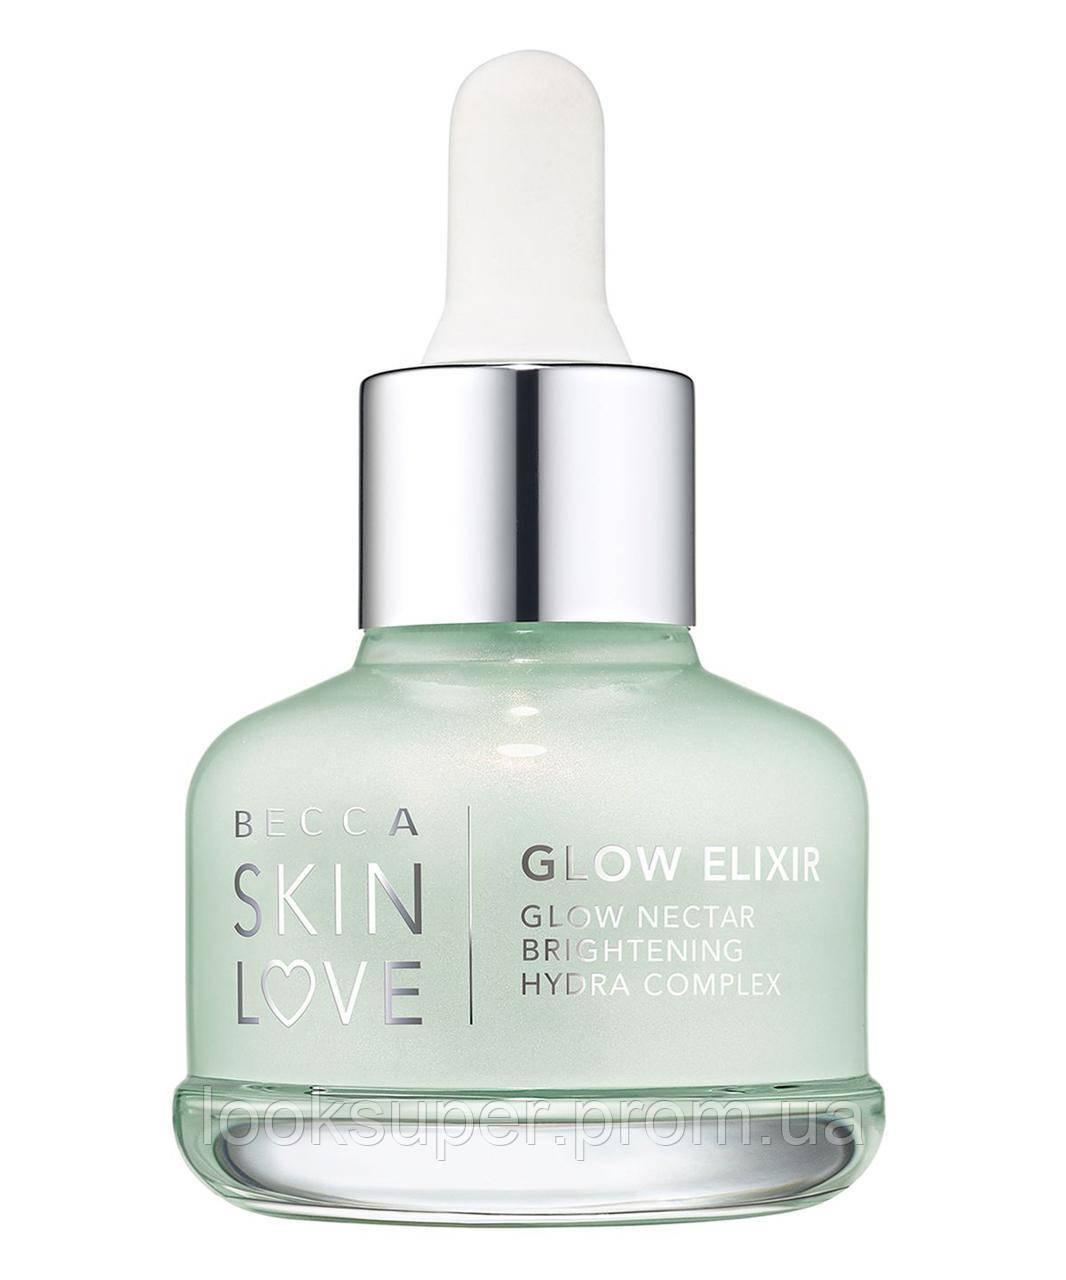 Праймер-сыворотка BECCA Skin Love Glow Elixir